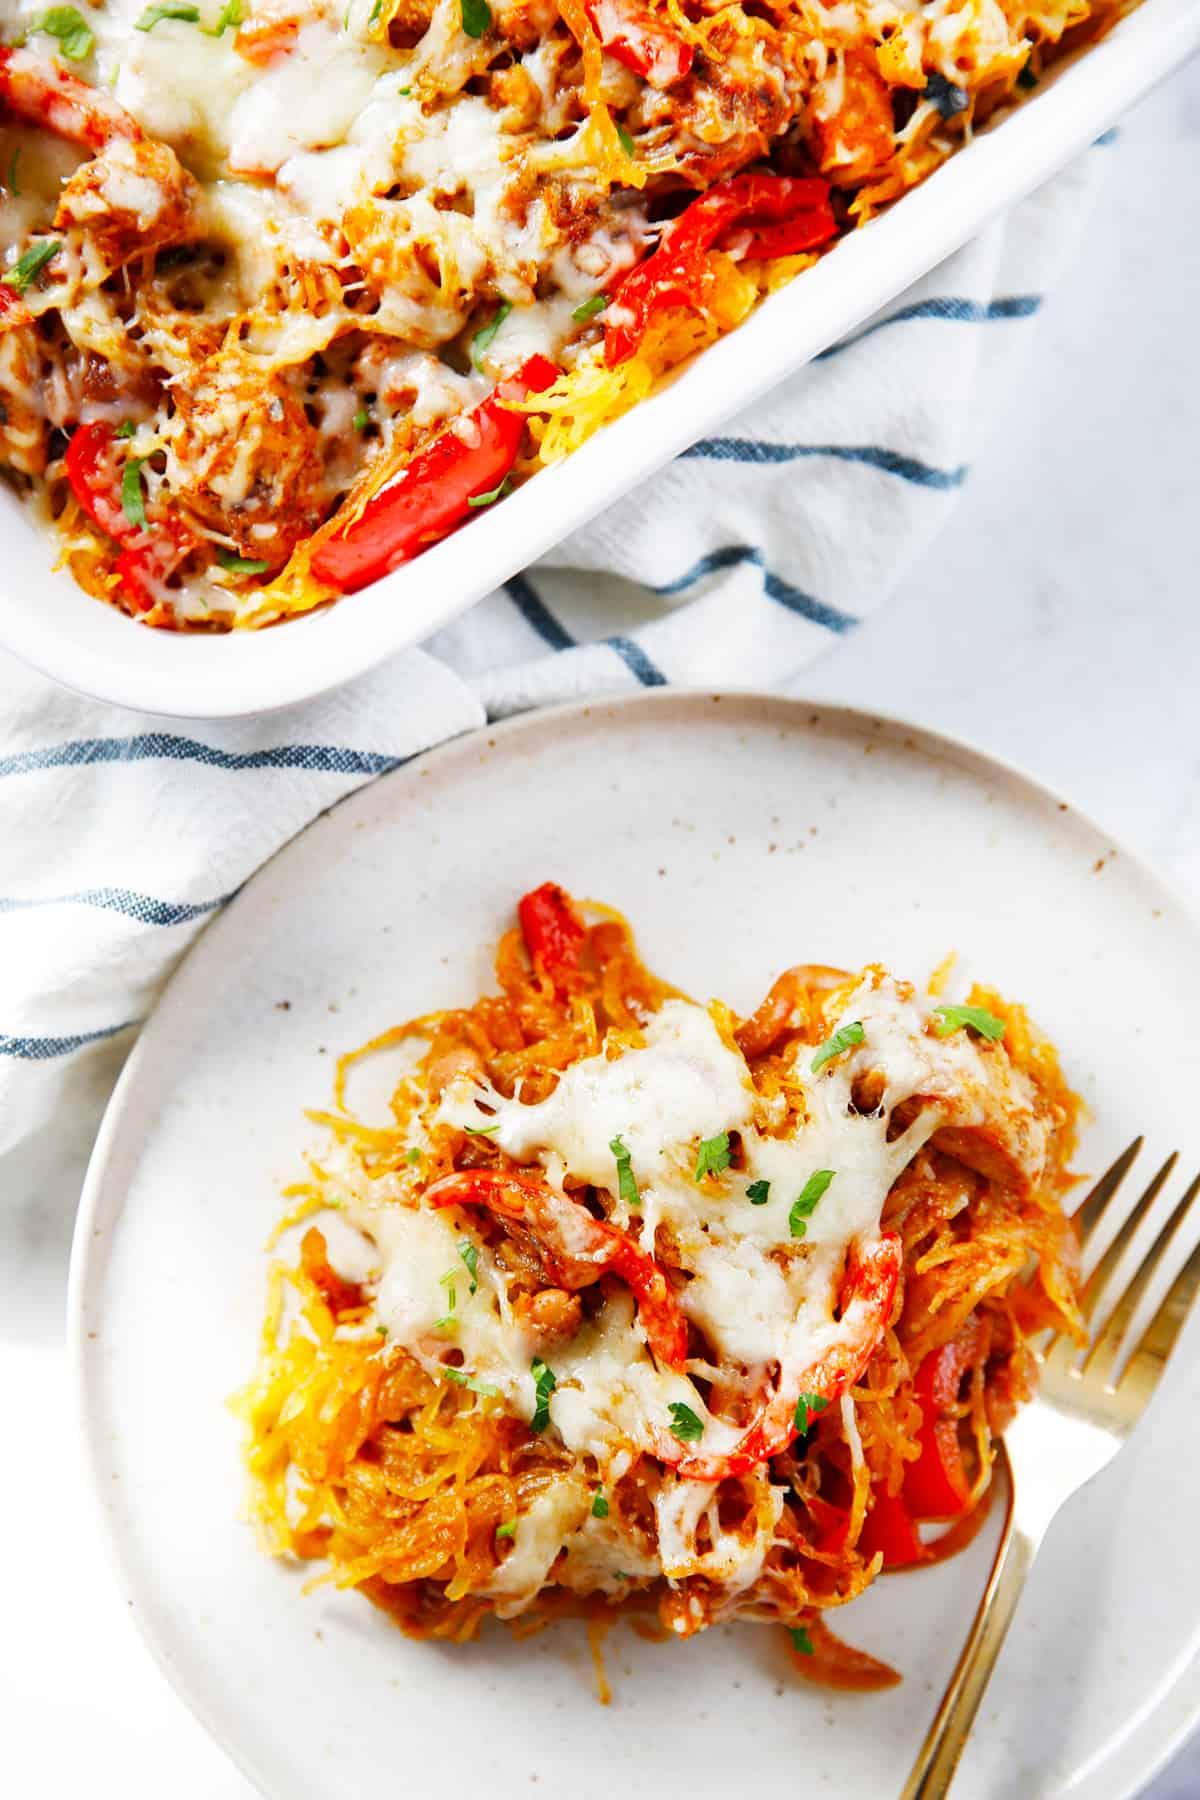 A serving of fajita spaghetti squash casserole on a plate.